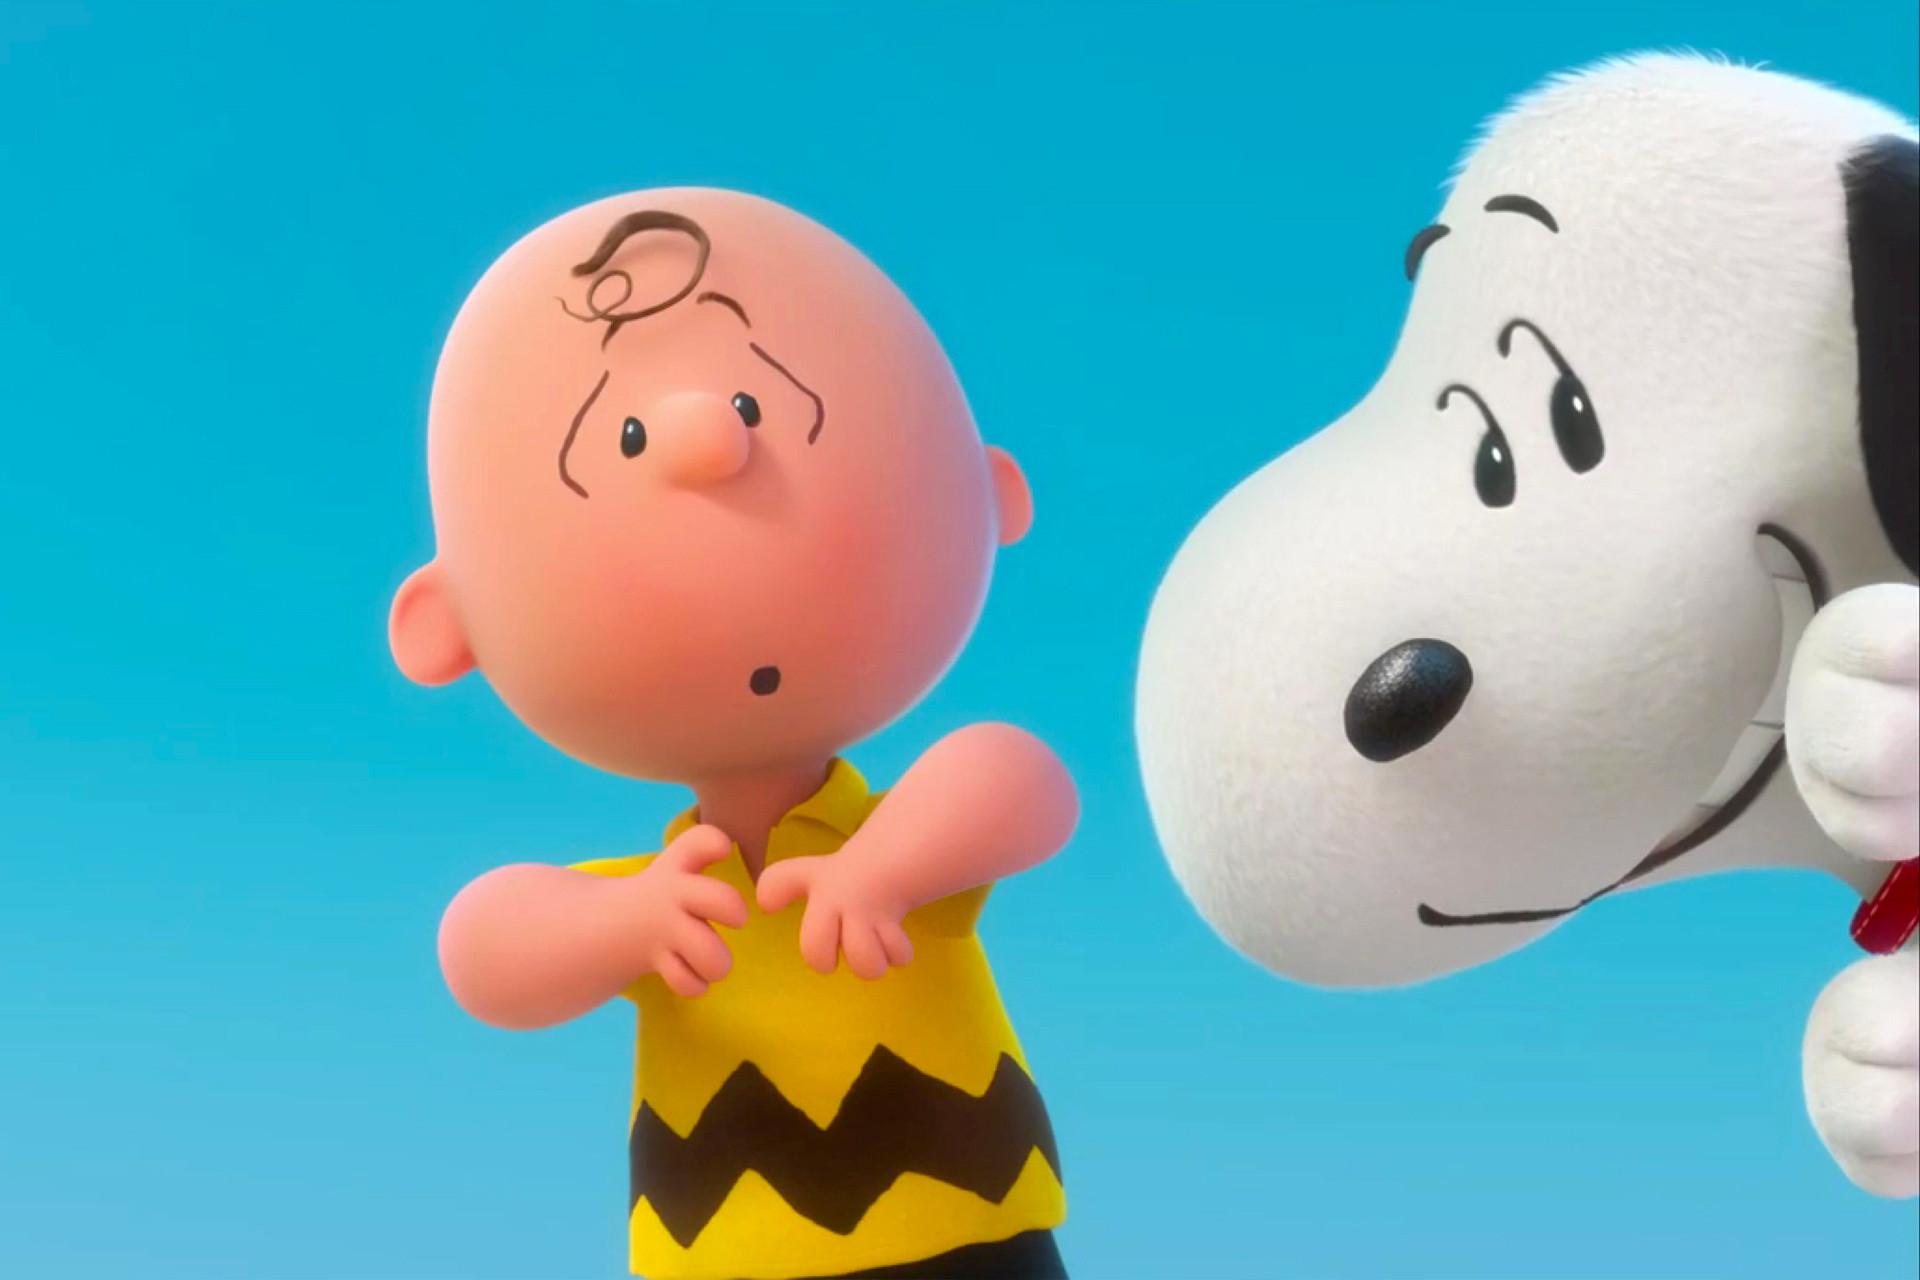 Cartoon · A Charlie Brown Christmas wallpaper Cartoon wallpapers